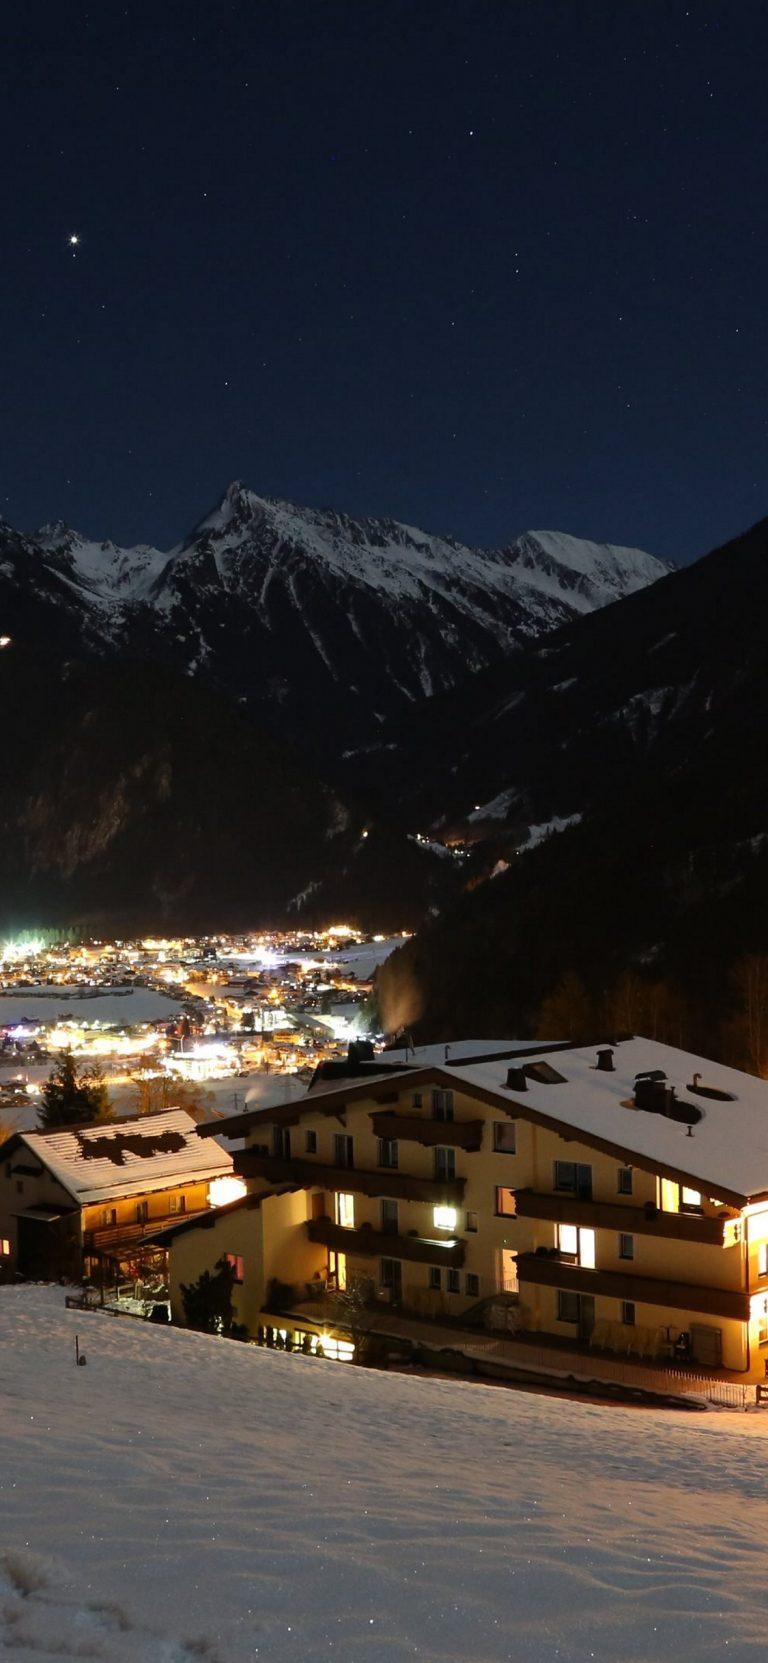 Mayrhofen Wallpaper 1125x2436 768x1663